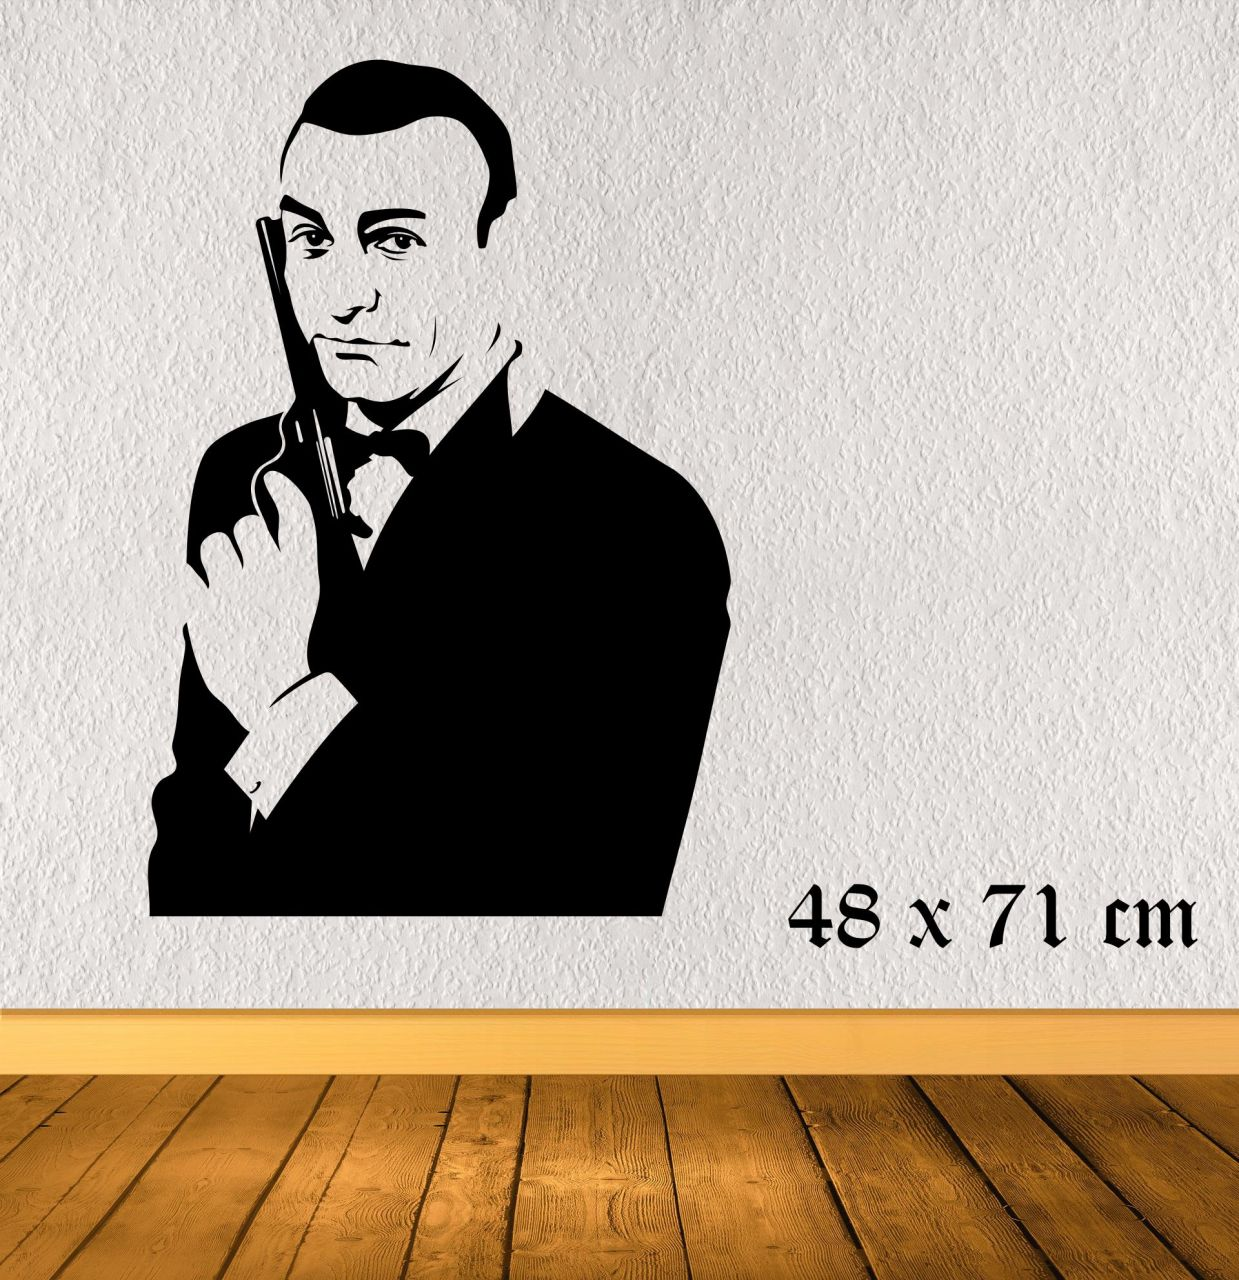 James Bond links